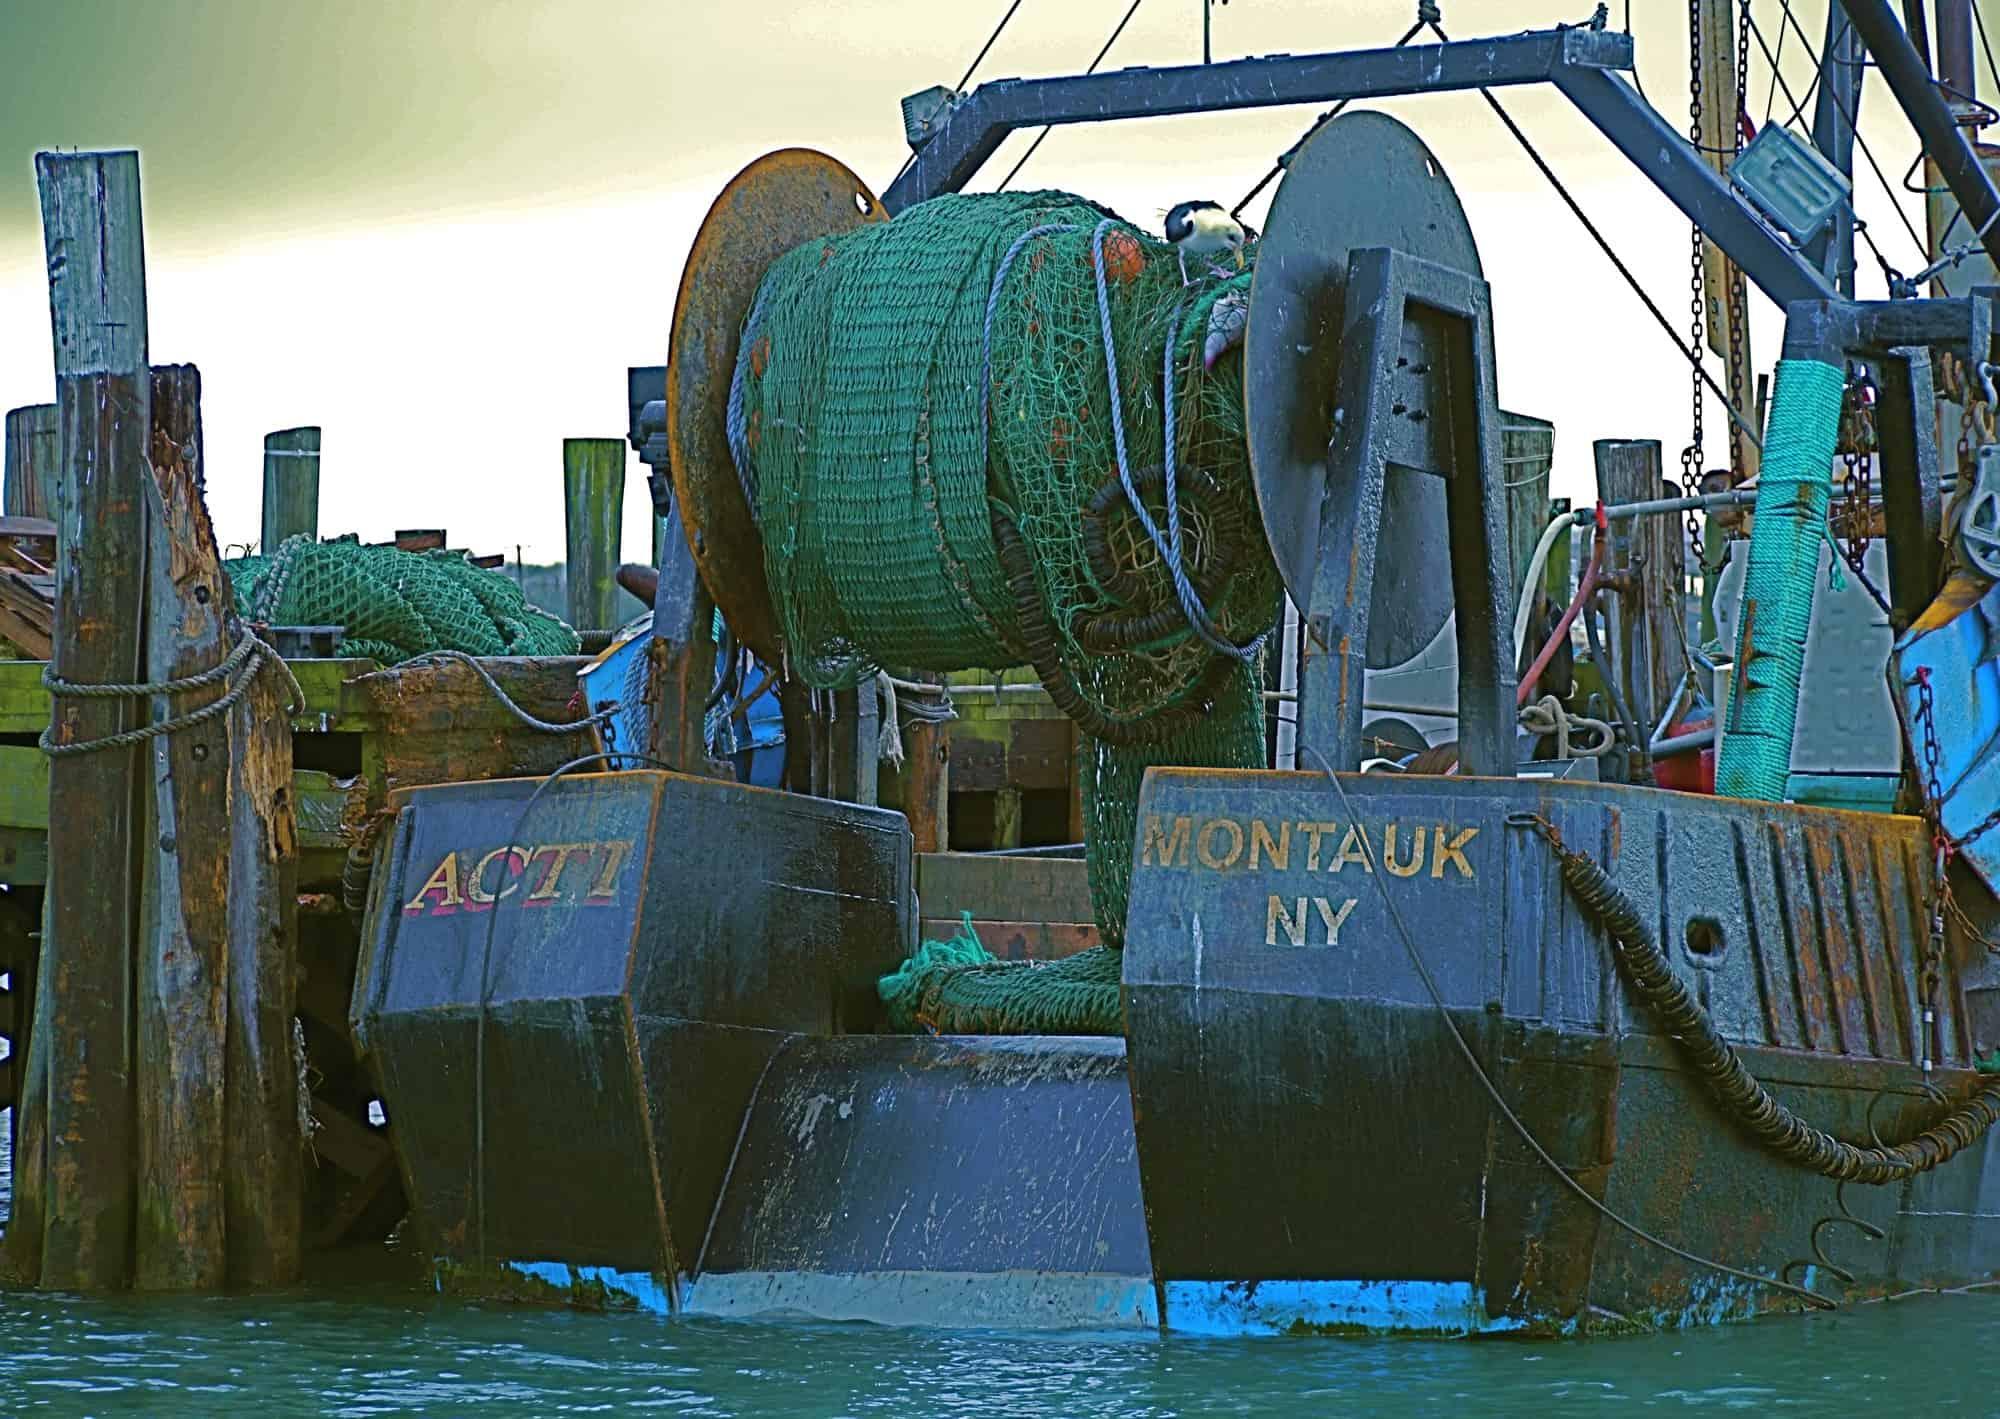 F/V ACT I at town dock in Montauk Harbor, photographed from the charter sailing catamaran MON TIKI